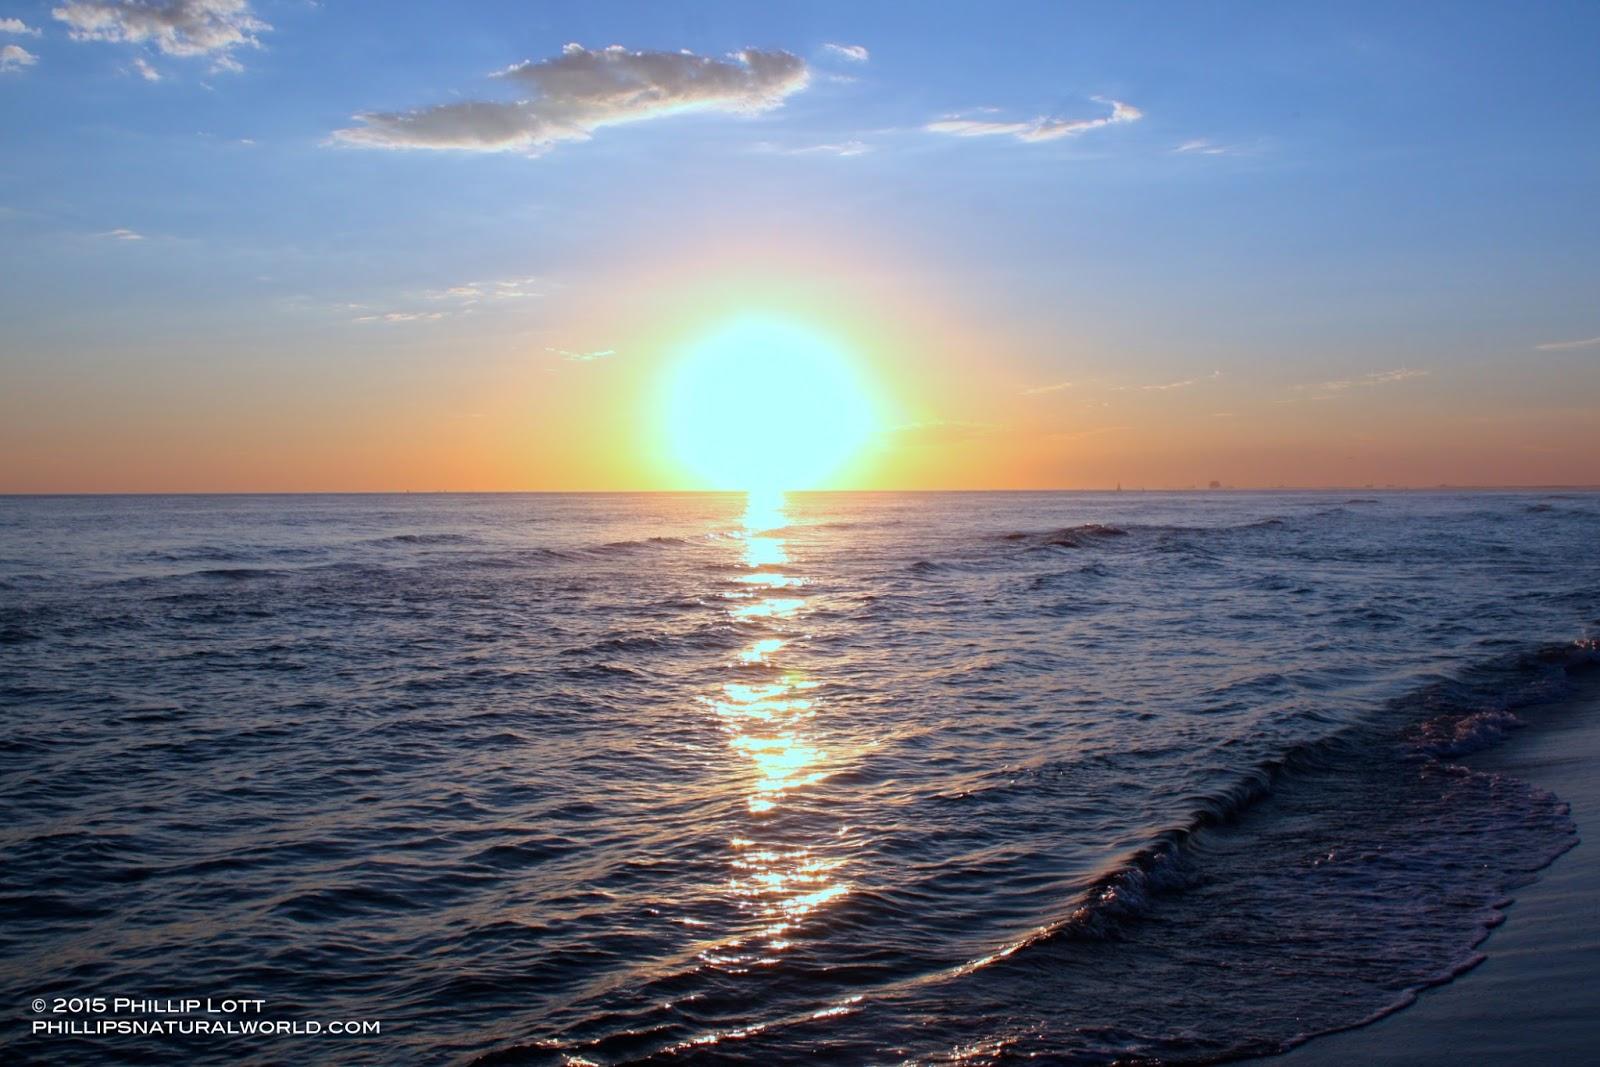 Summer Solstice Sandhills >> Summer Solstice And Alligators Phillip S Natural World